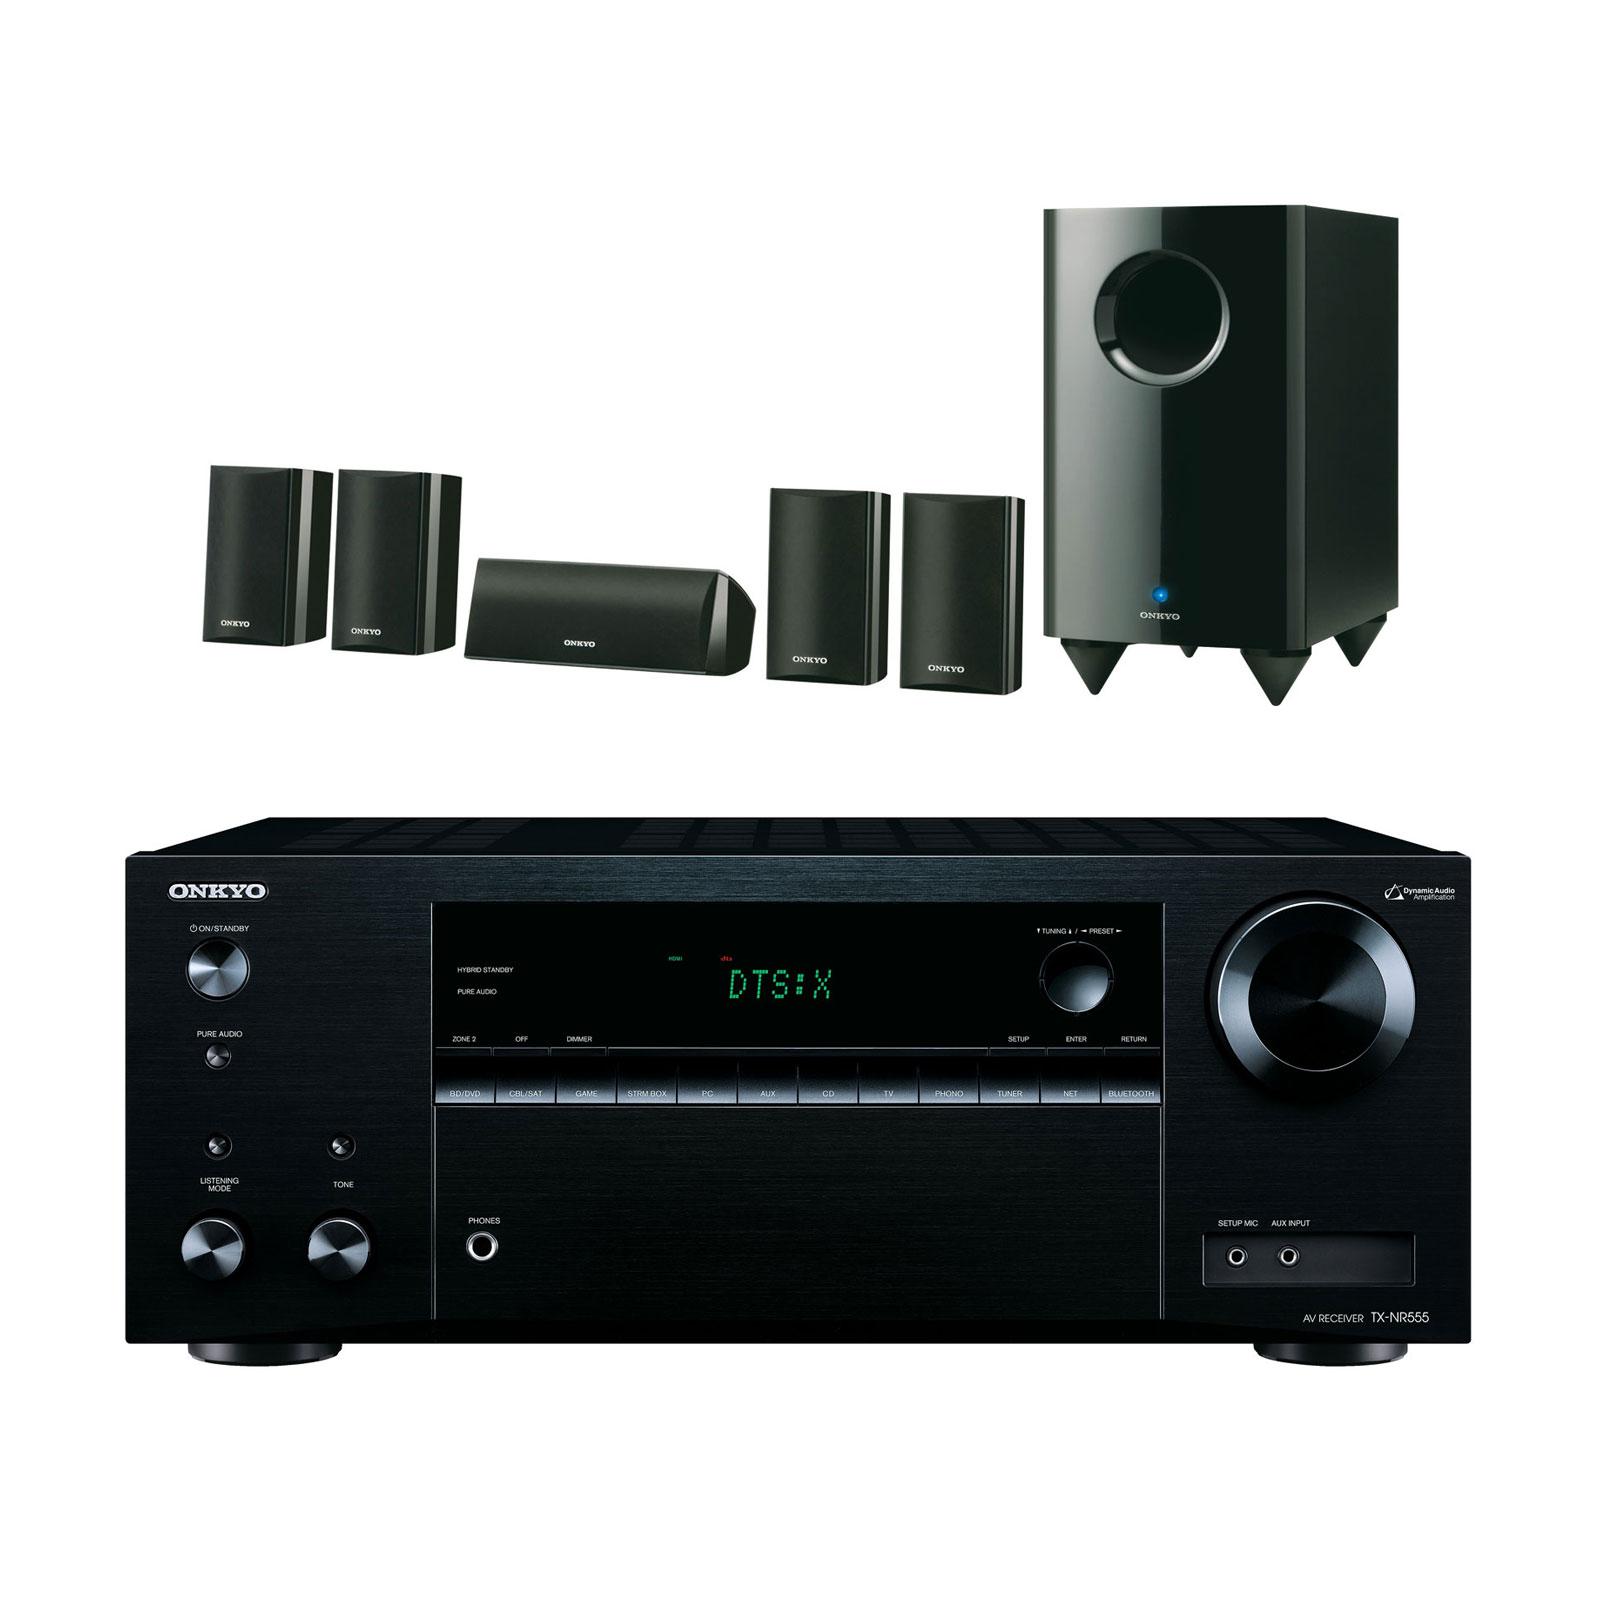 Ensemble home cinéma Onkyo TX-NR555 Noir + SKS-HT528 Ampli-tuner Home Cinéma 7.2 3D Ready Wi-Fi, Bluetooth, AirPlay avec HDMI 4K, DAC AKM, DTS:X et Dolby Atmos + Pack d'enceintes 5.1